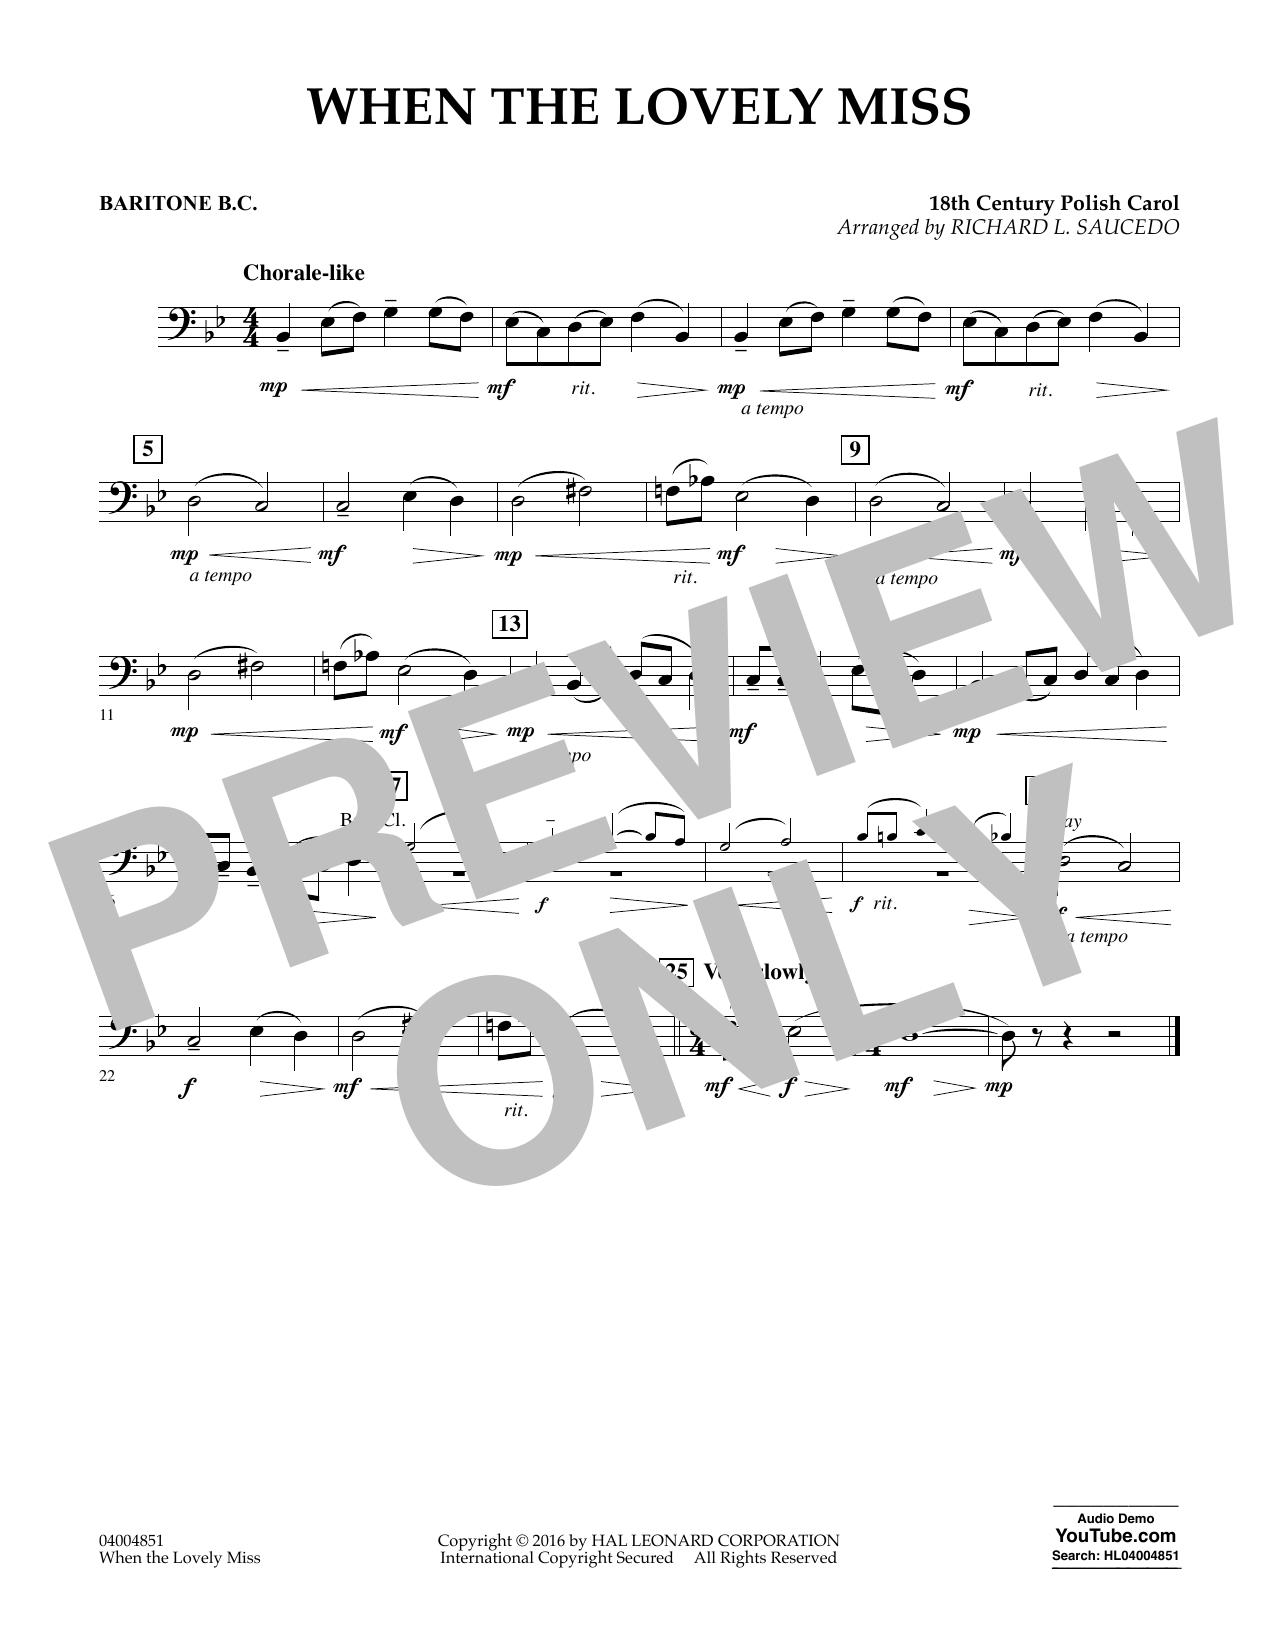 When the Lovely Miss (18th Century Polish Carol) - Baritone B.C. (Concert Band)